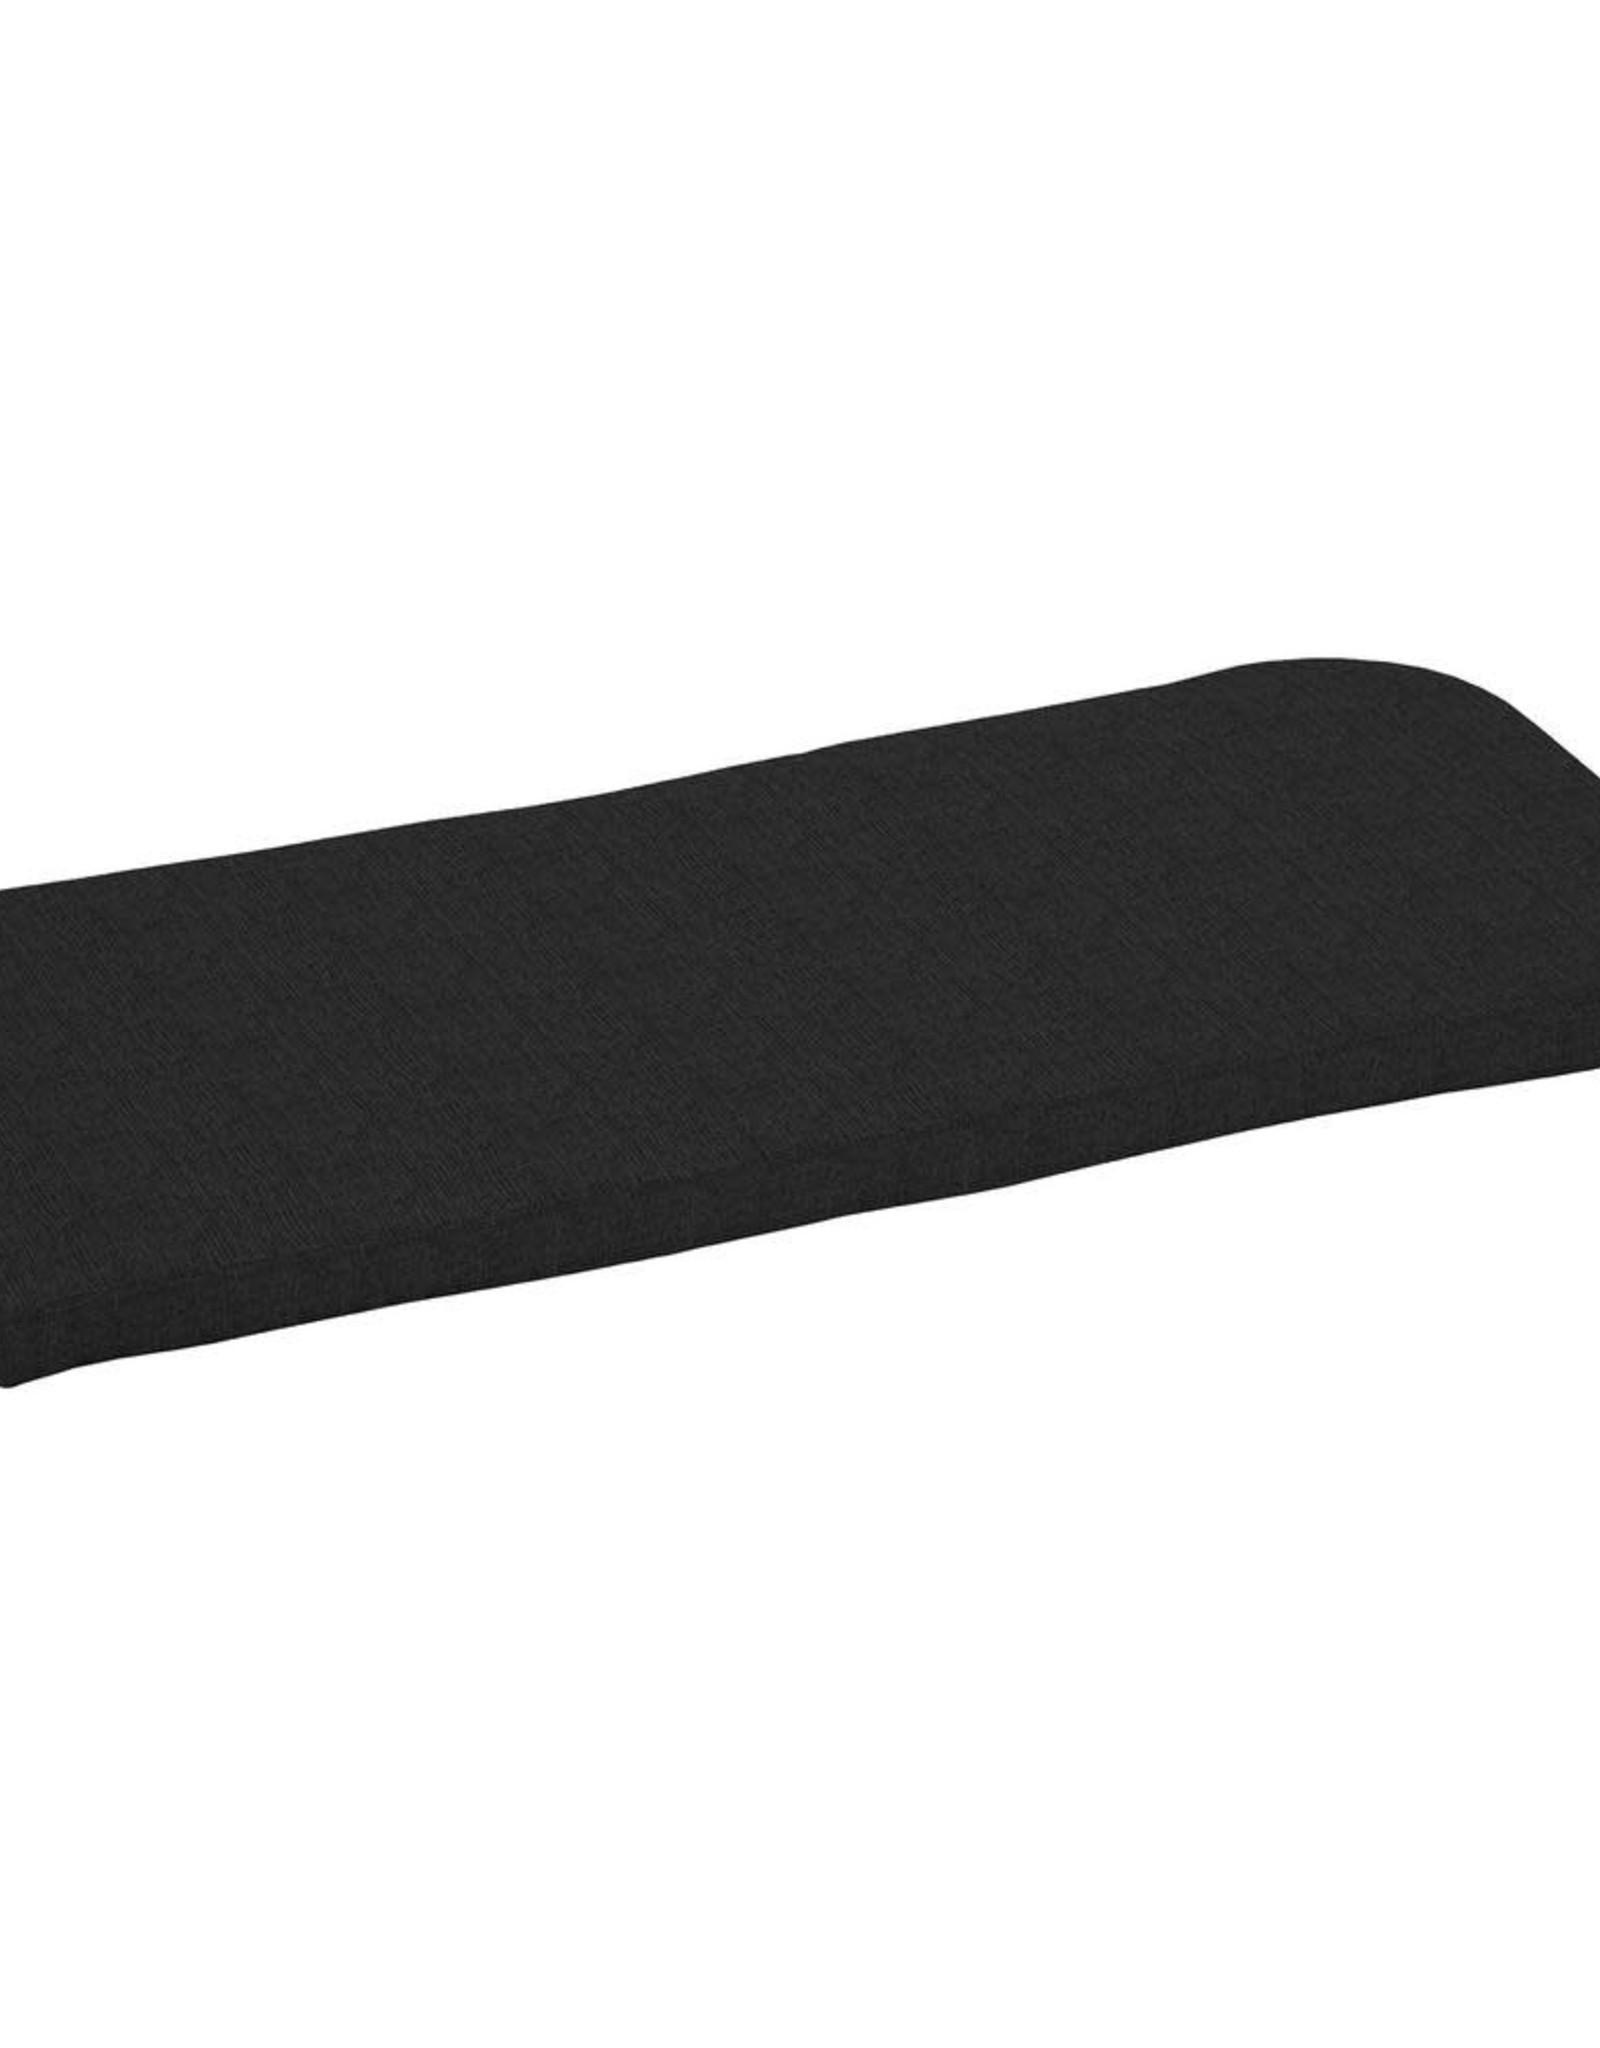 42 x 18 Sunbrella Canvas Black Outdoor Bench Cushion